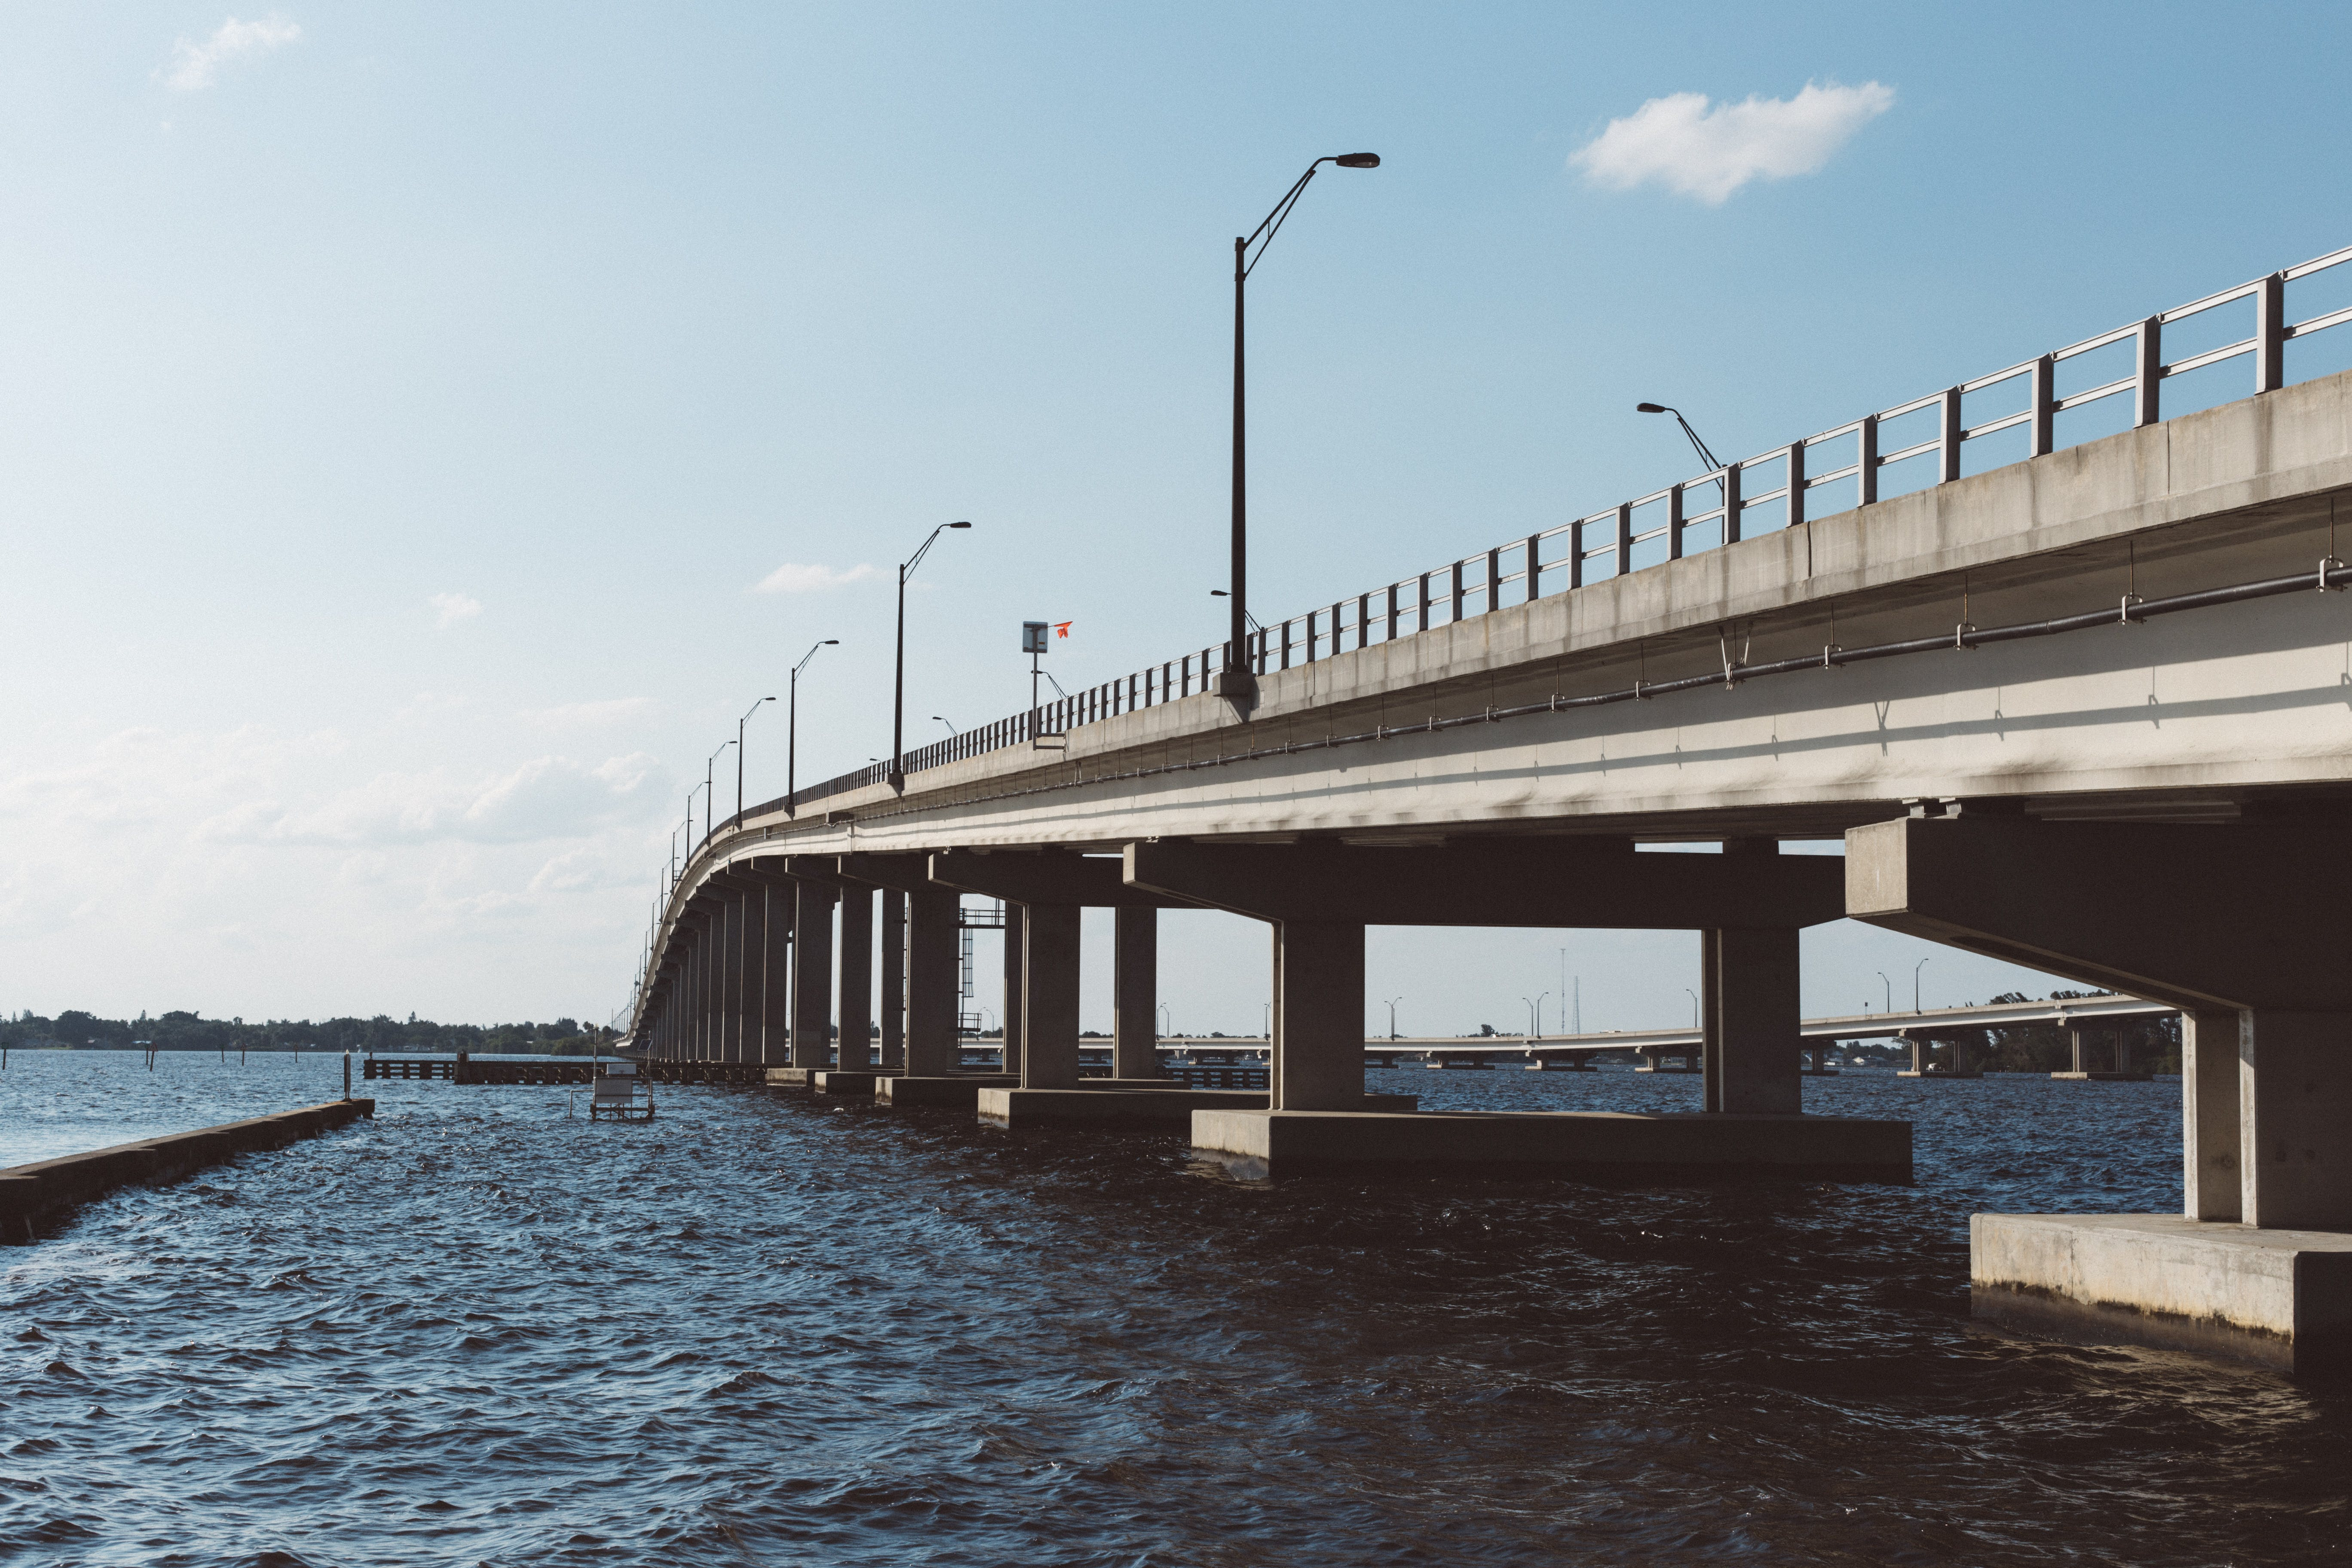 Kostenloses Stock Foto zu brücke, himmel, infrastruktur, meer